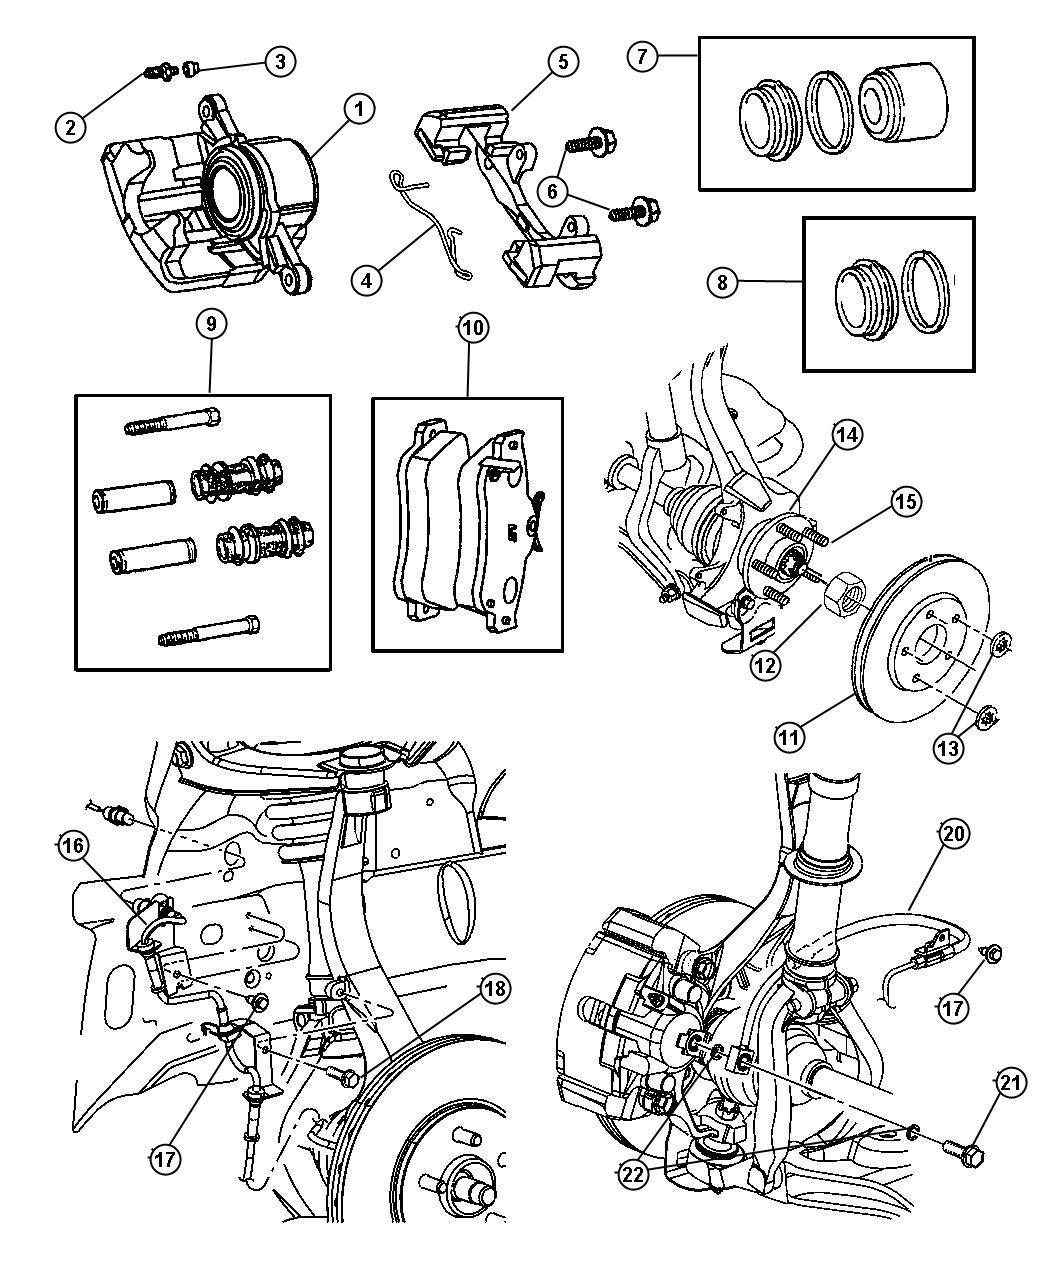 Dodge Durango Rotor. Brake. Brakes, front, mopar